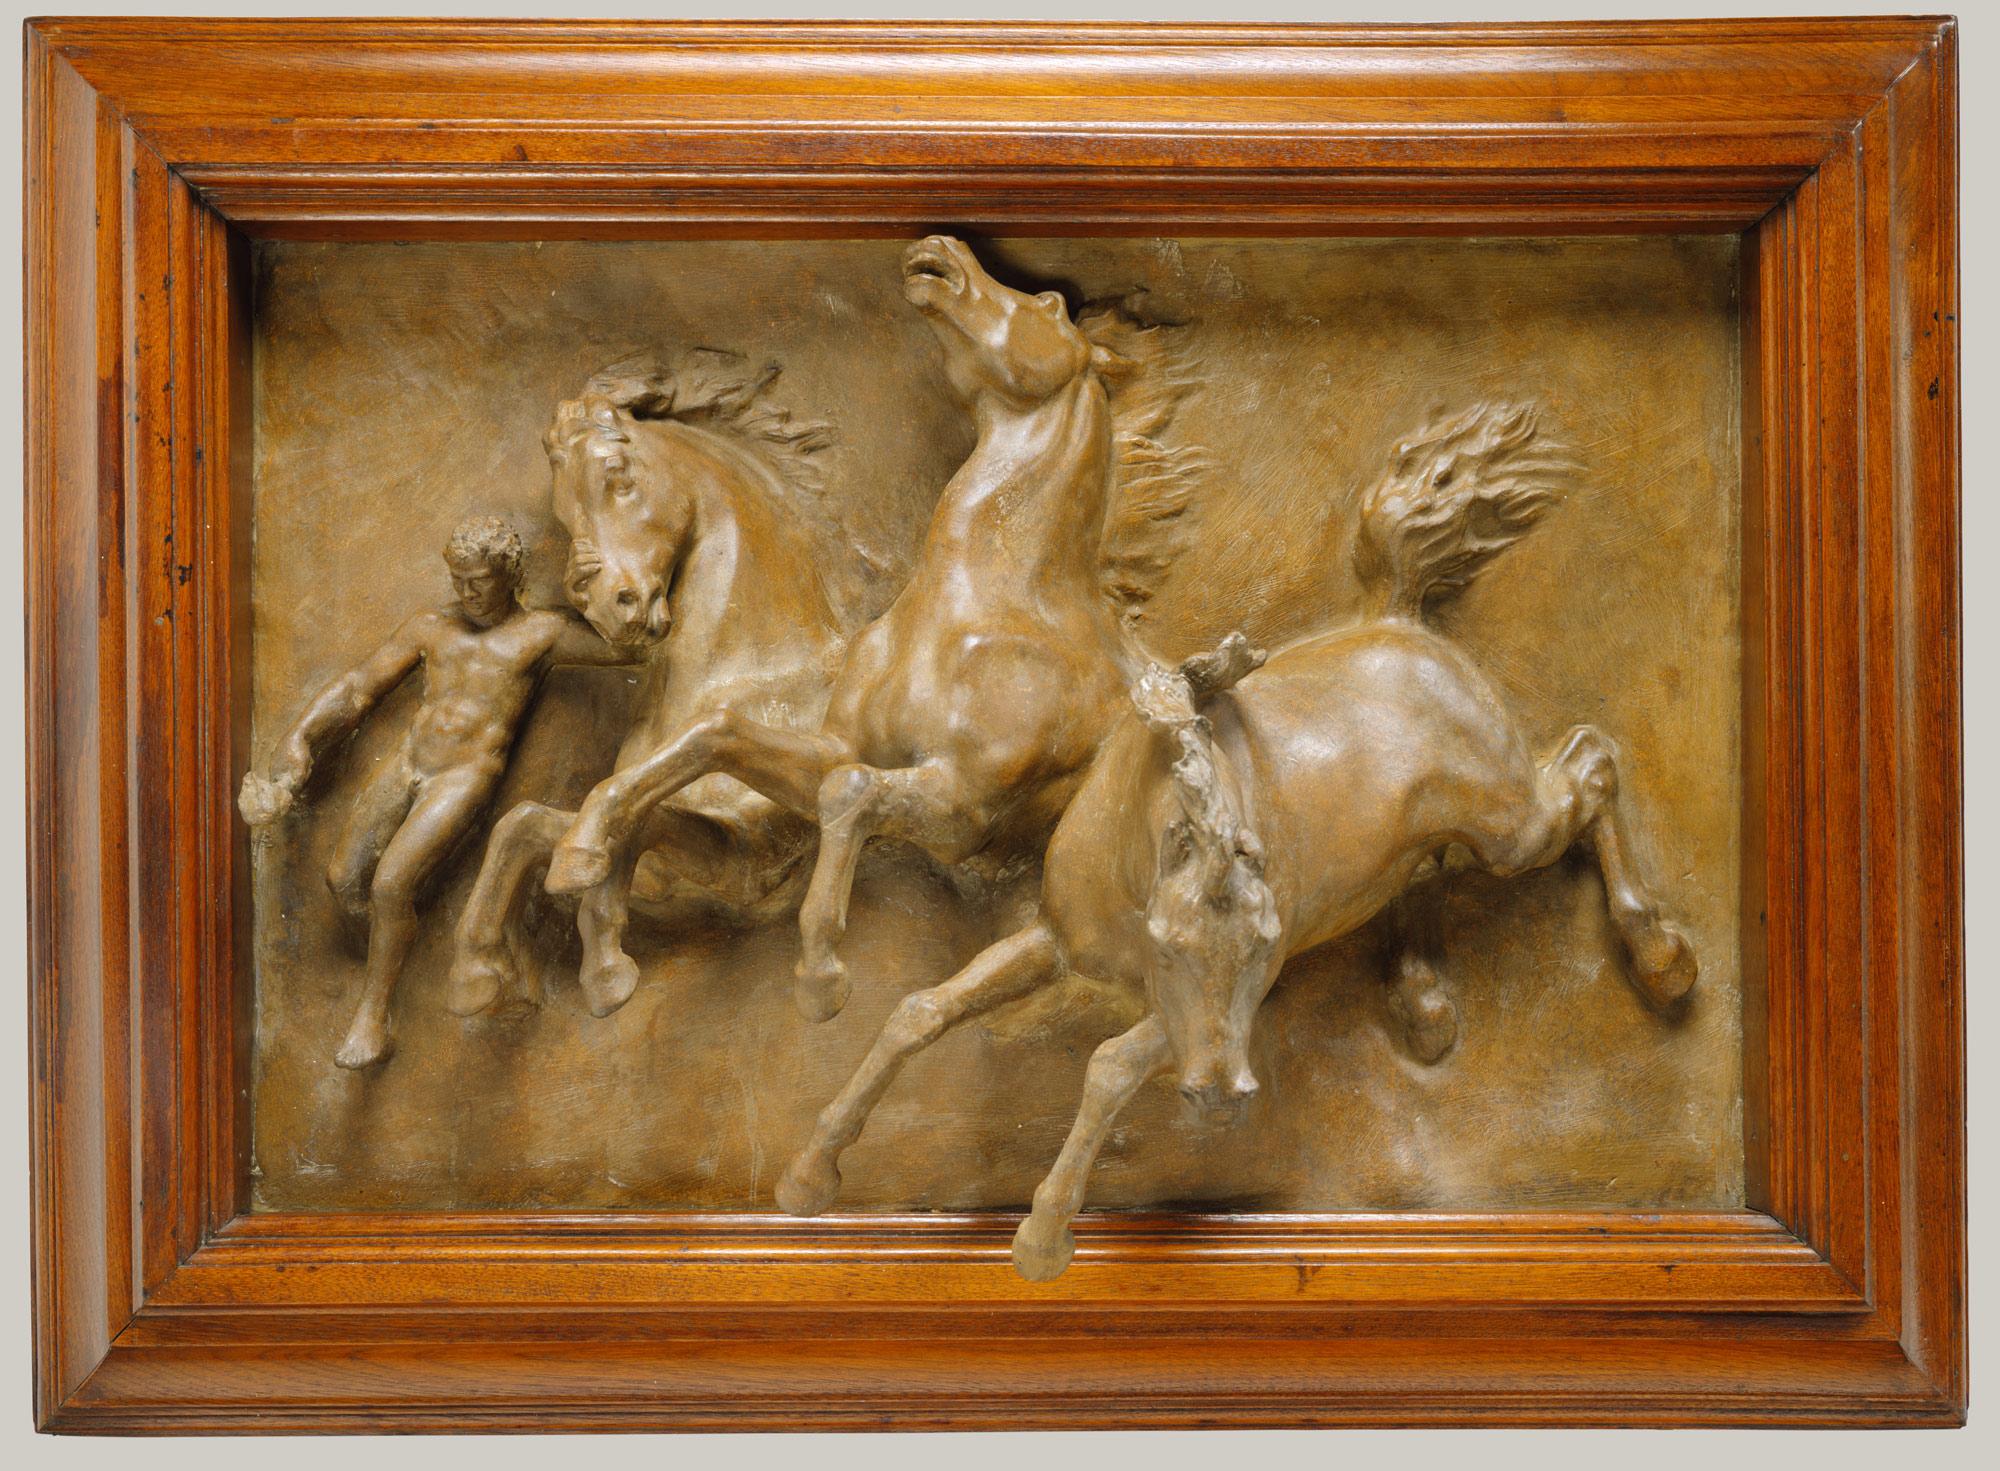 American relief sculpture essay heilbrunn timeline of